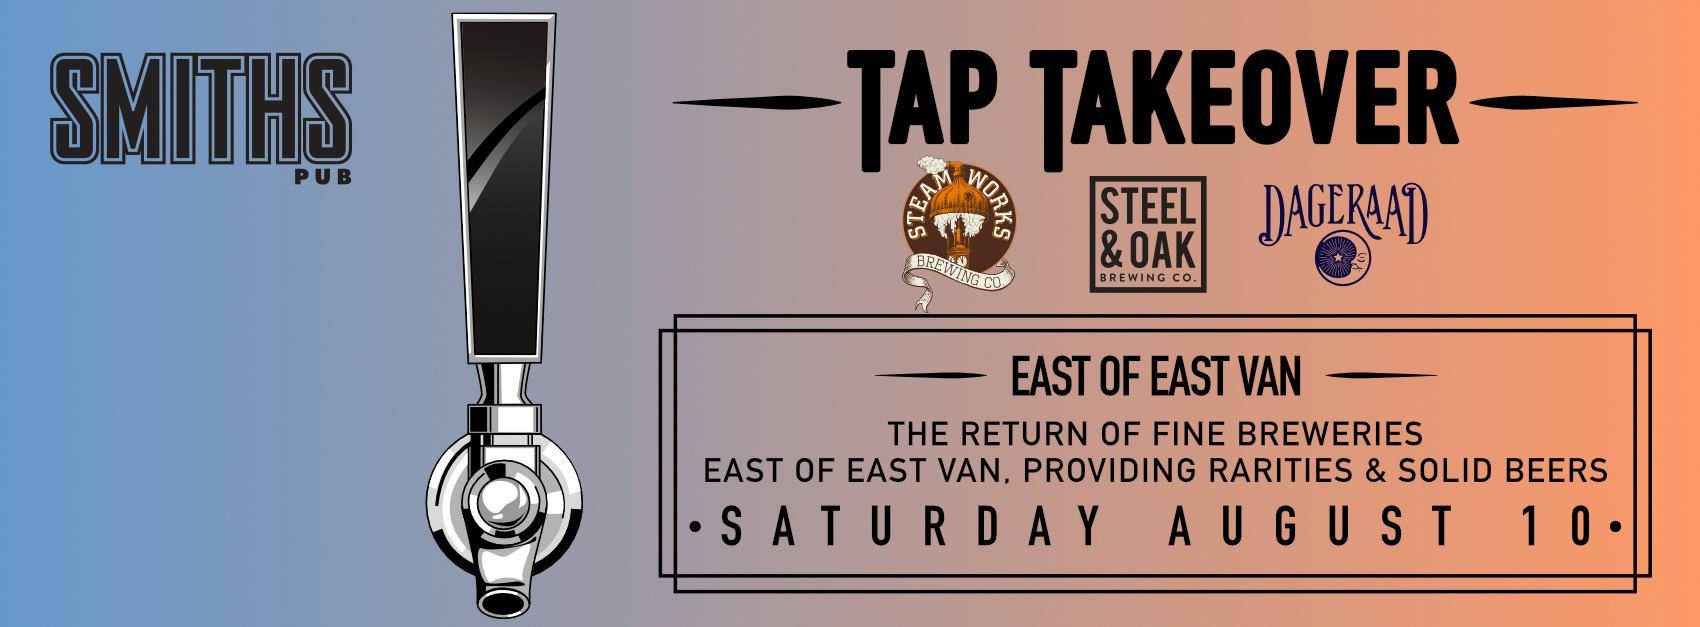 East Of East Van Tap Takeover